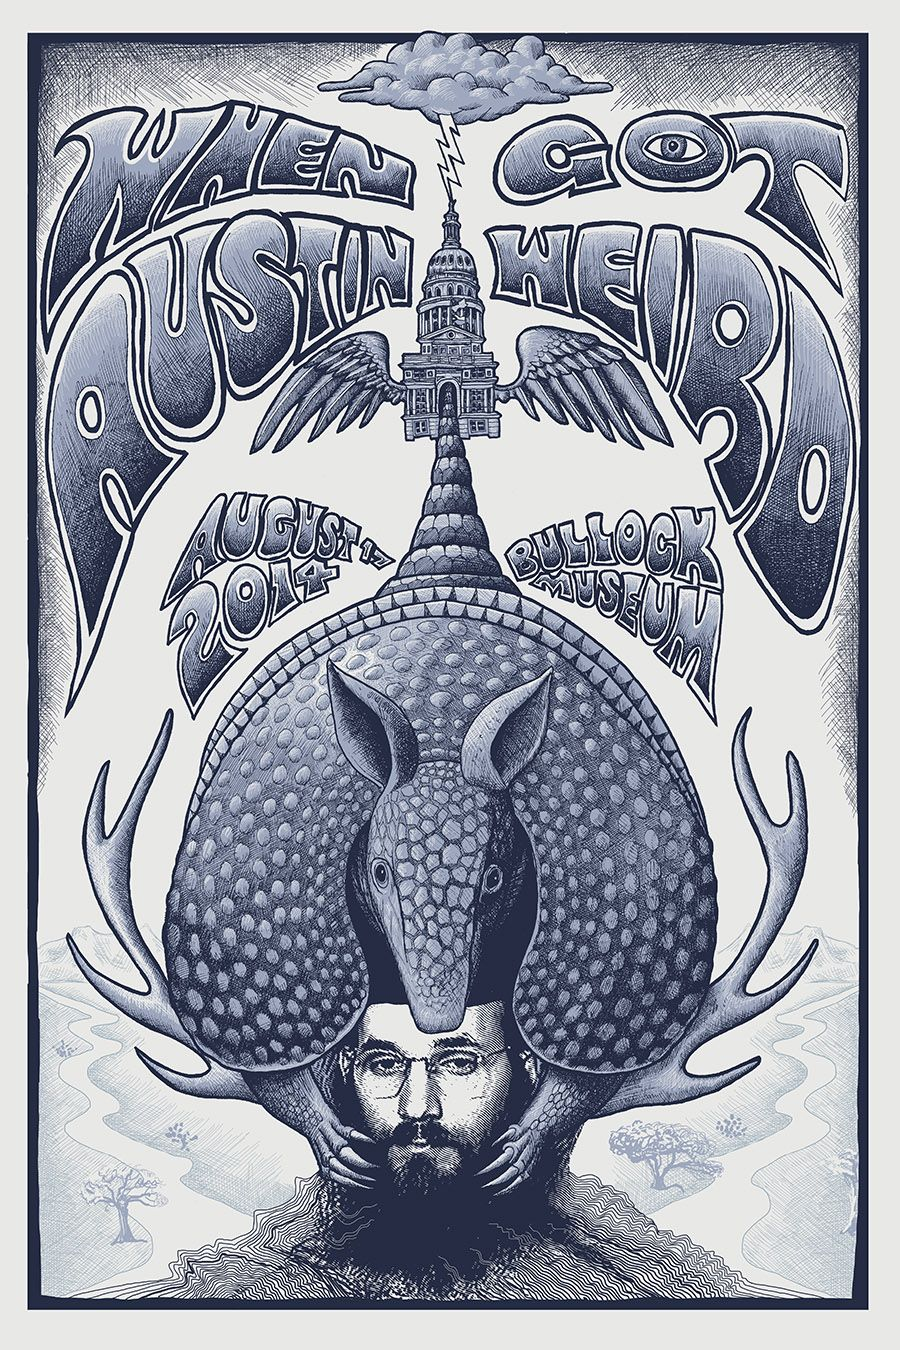 Jim Franklin Art Google Search Art Vintage Concert Posters